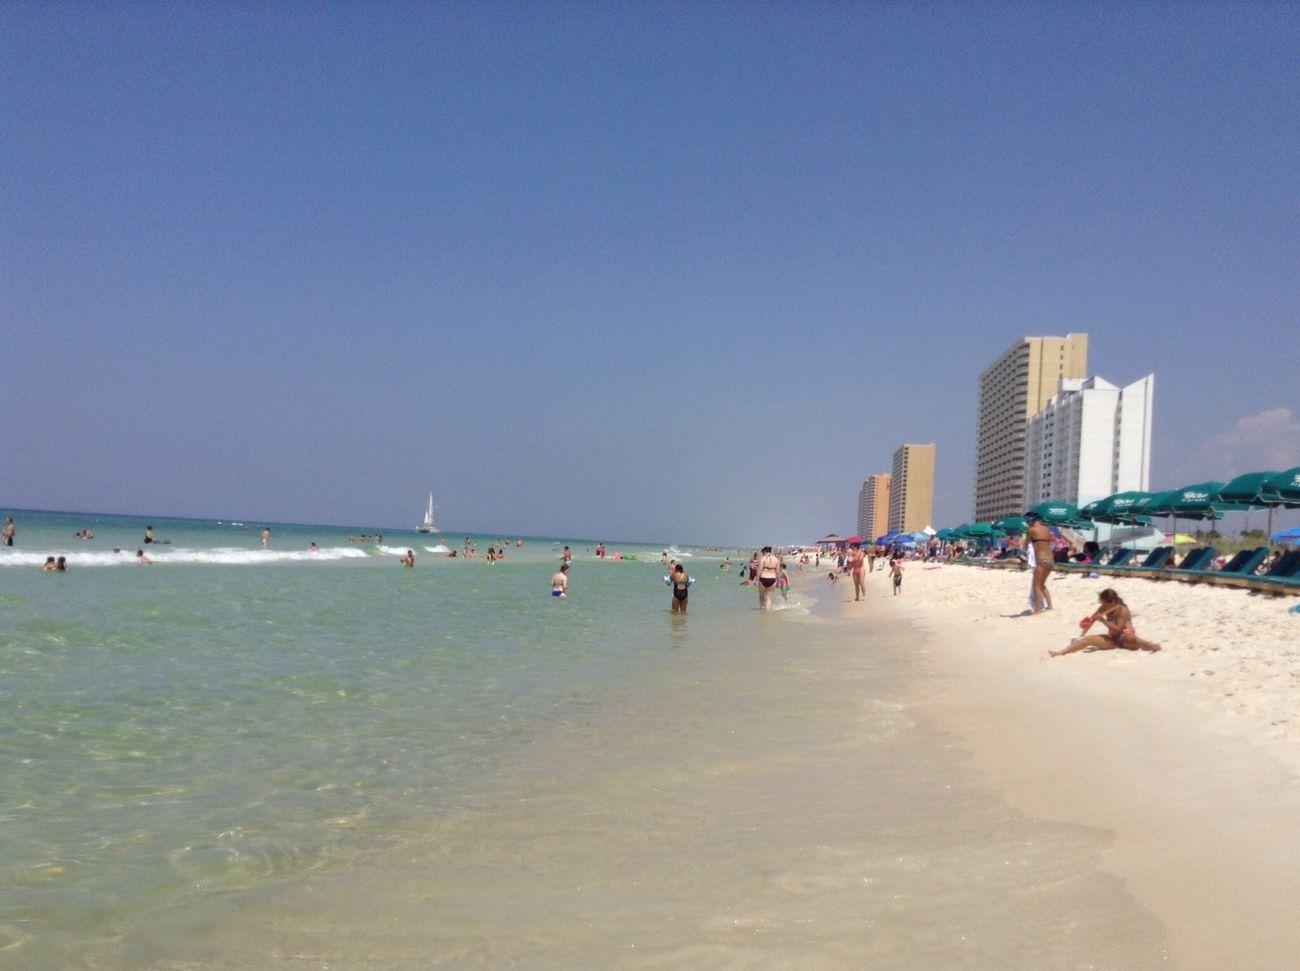 Beach In Love Never Wanna Leave